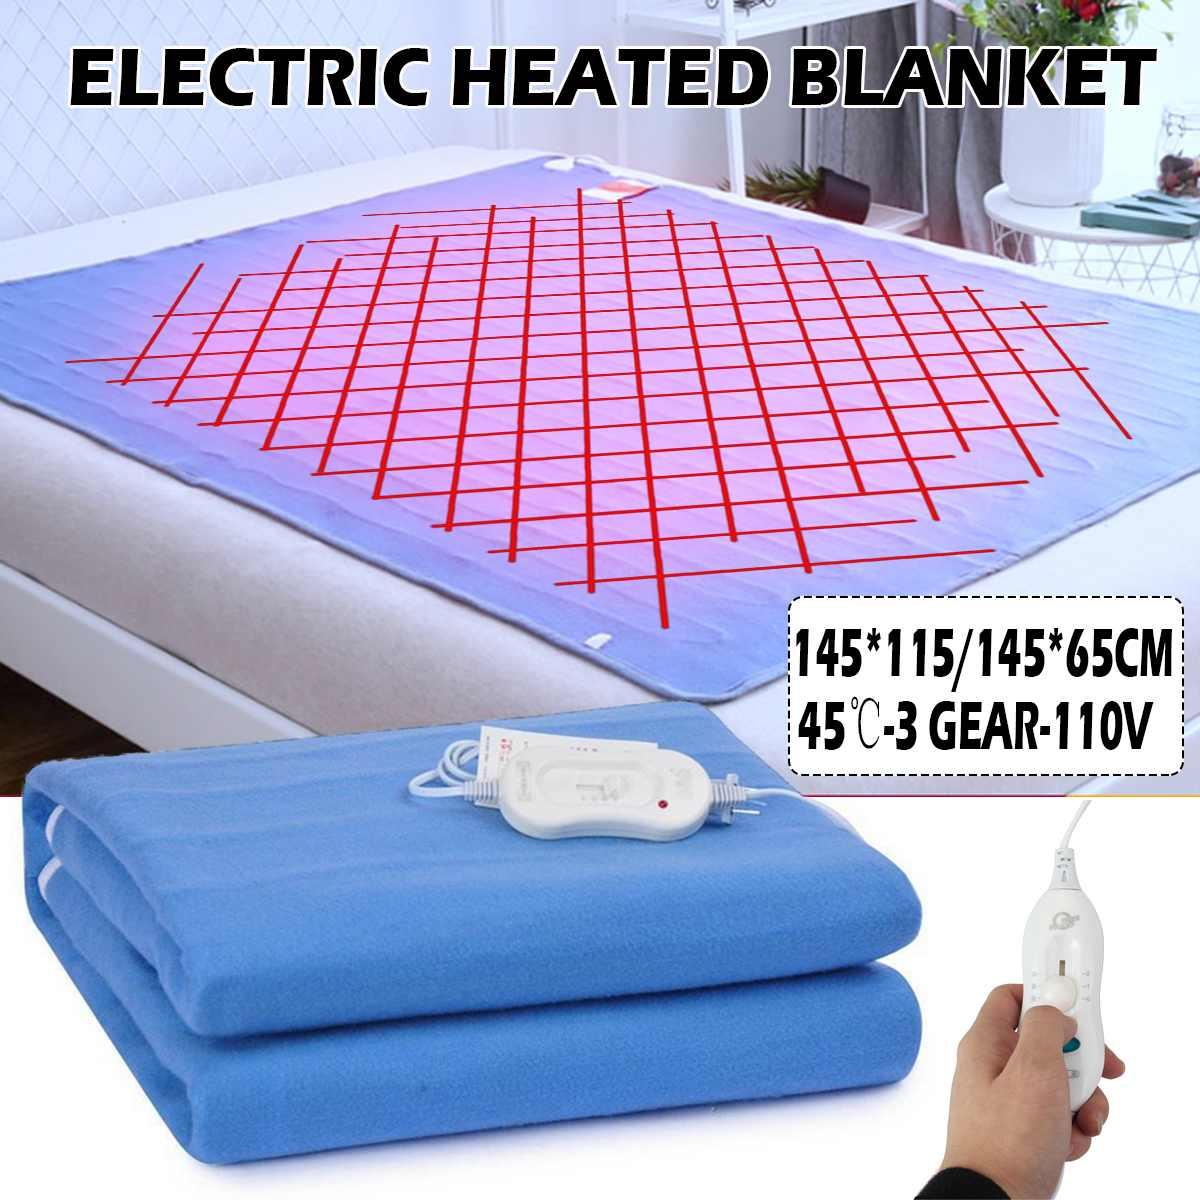 Electric Blanket Body Warmer Winter Single Heated Blanket Thermostat Electric Heating Blanket Carpet Household Beds Heaters Pad